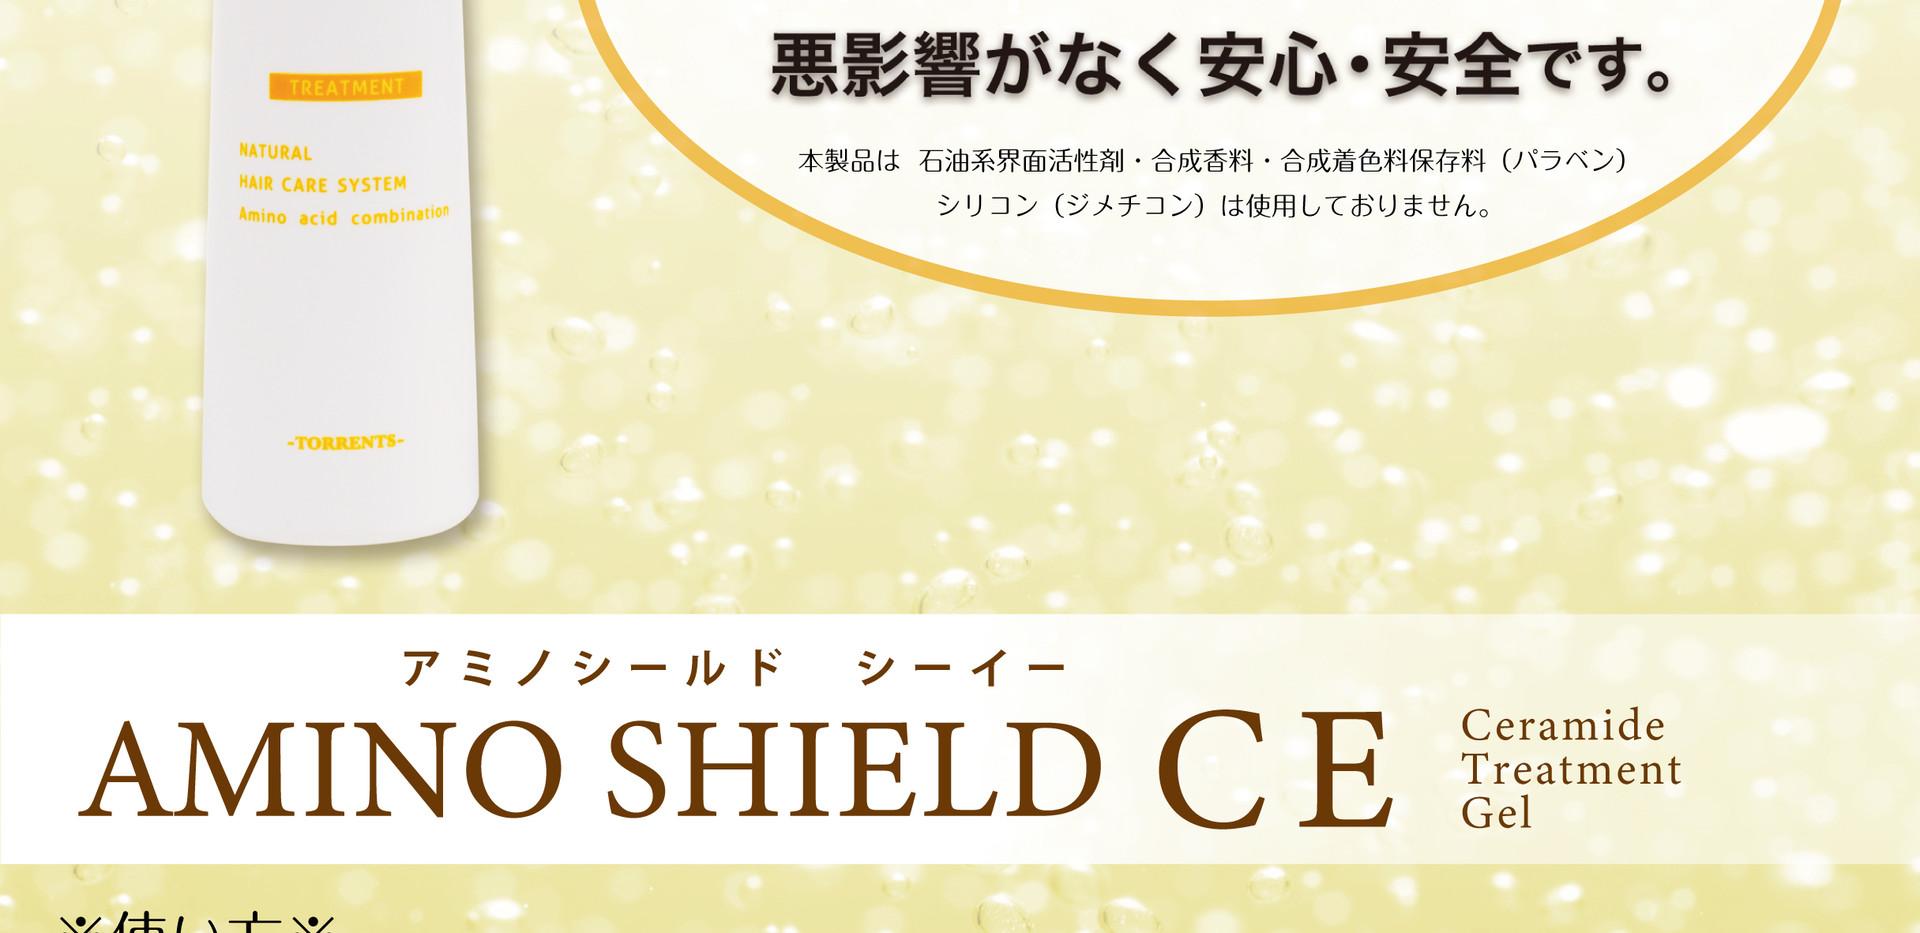 A4_CE_使い方_H31年Ver.jpg